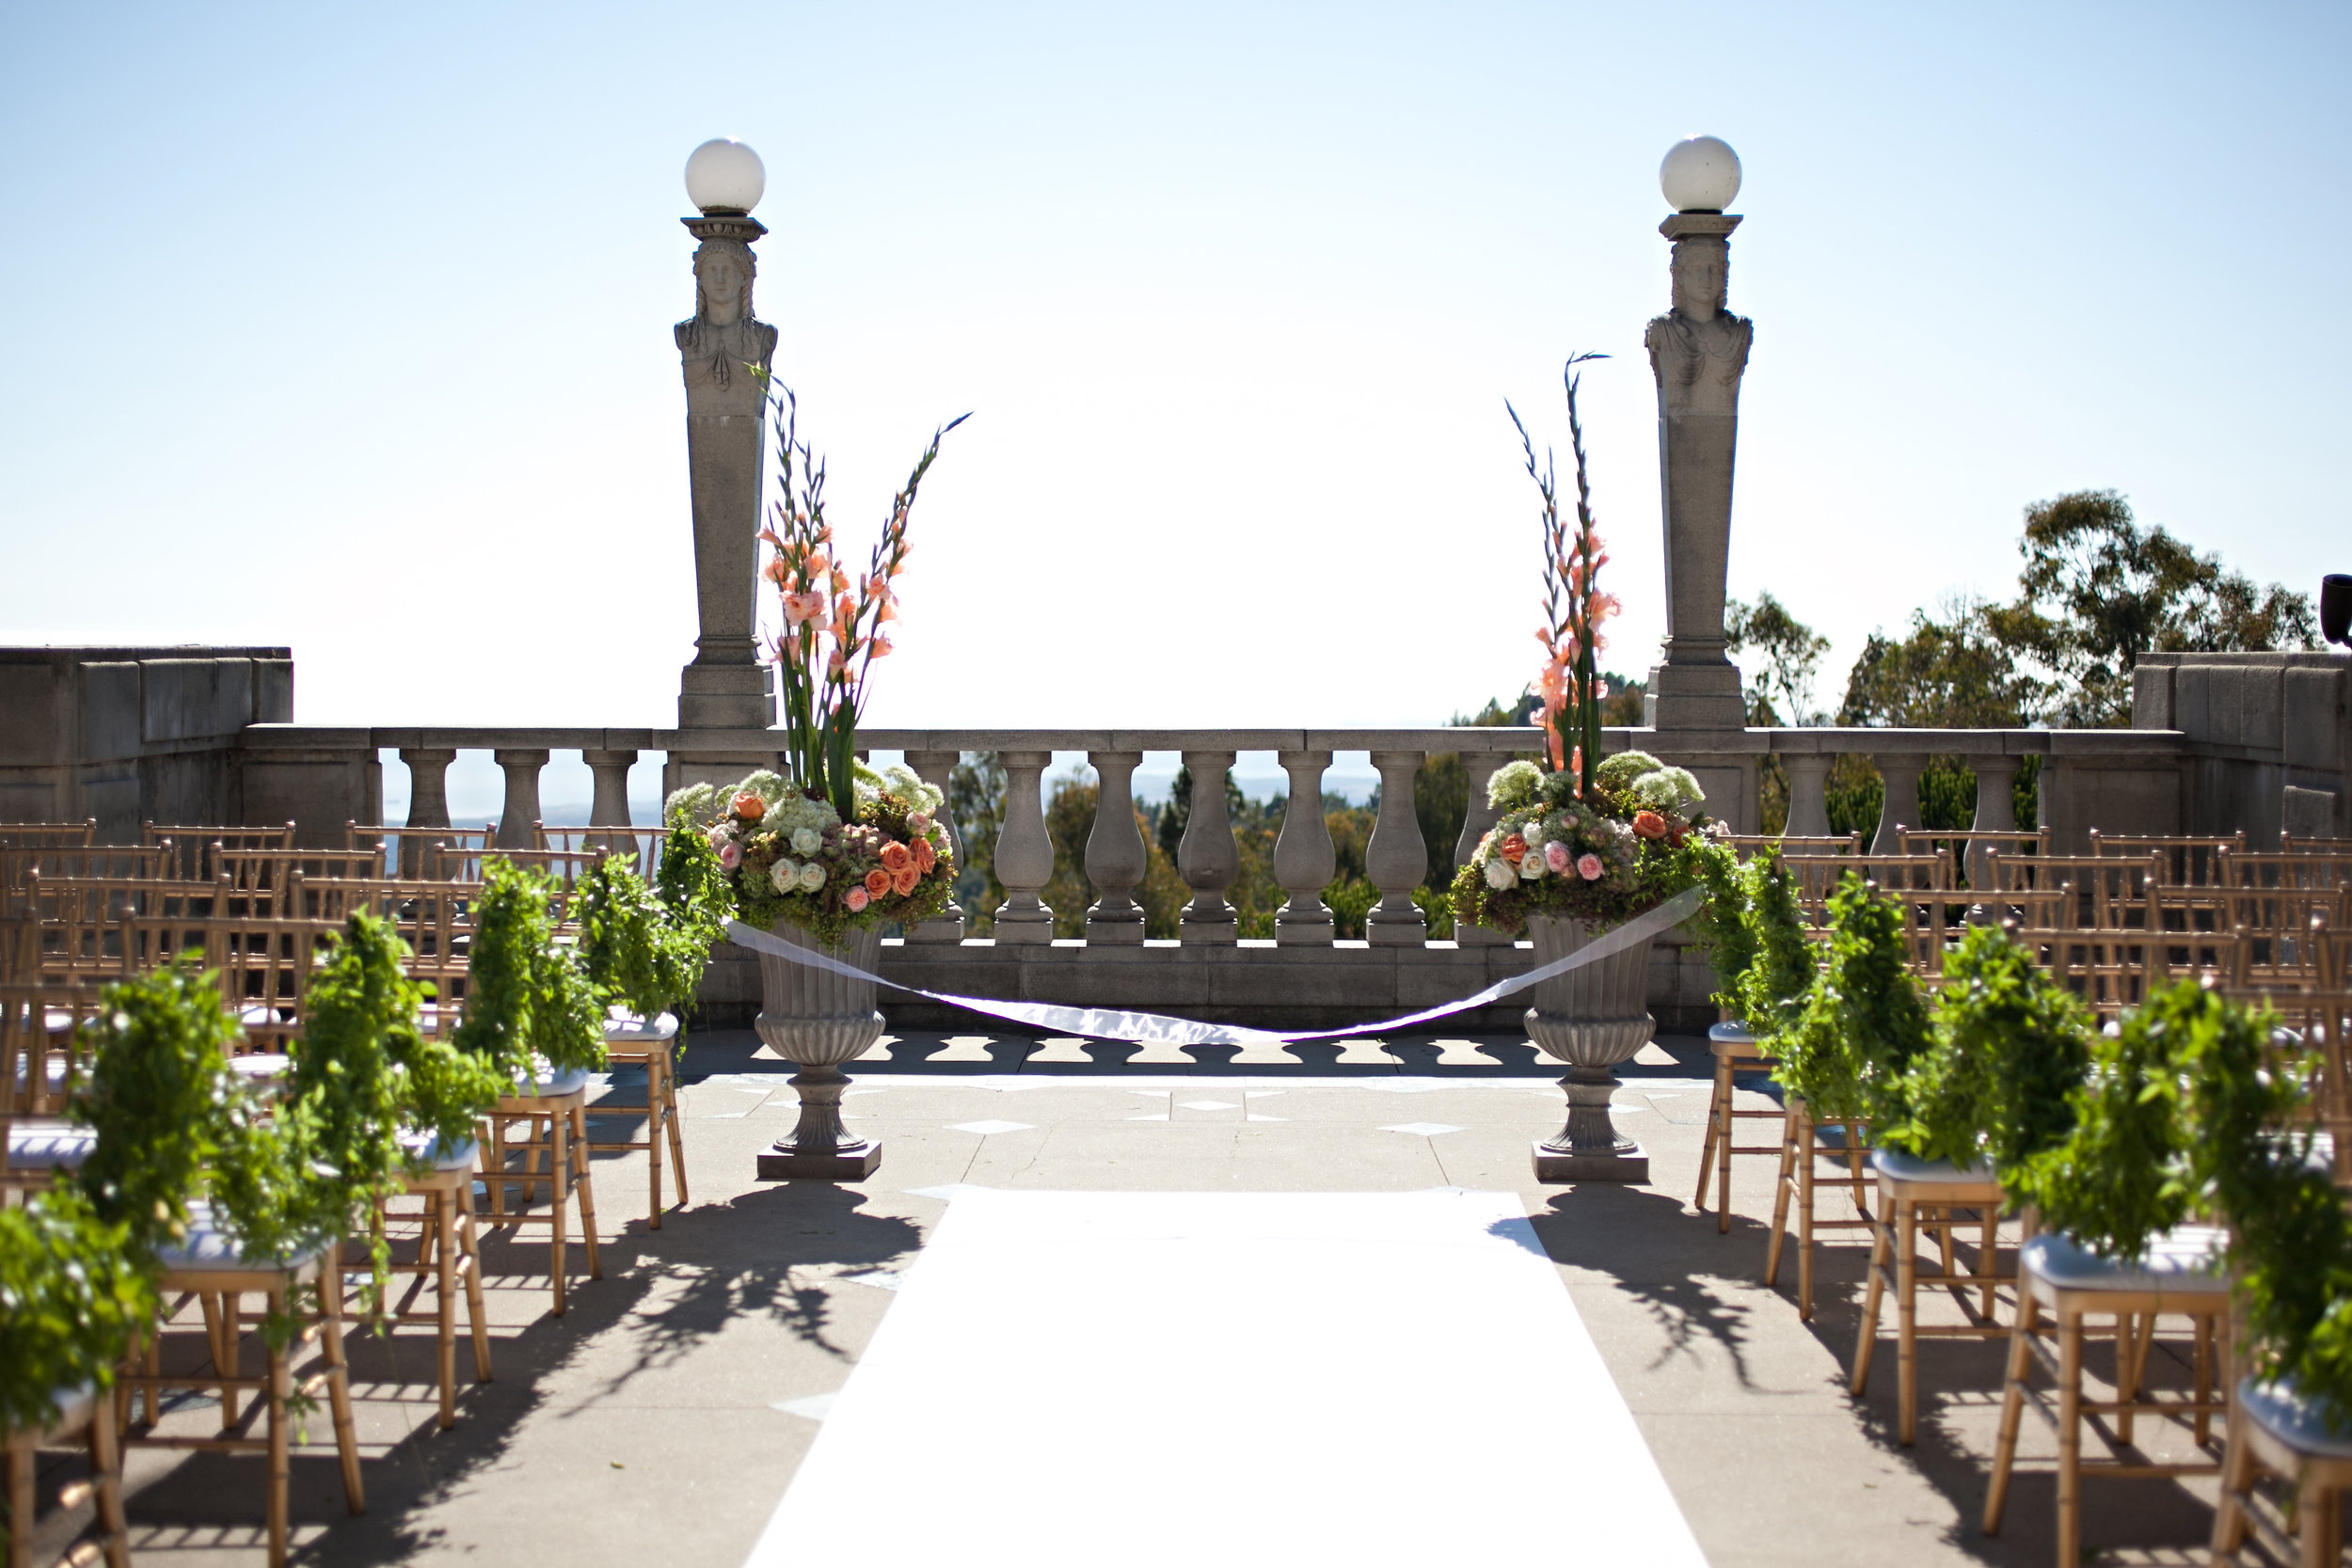 9136_linda_vu_wedding-1616989656-O.jpg